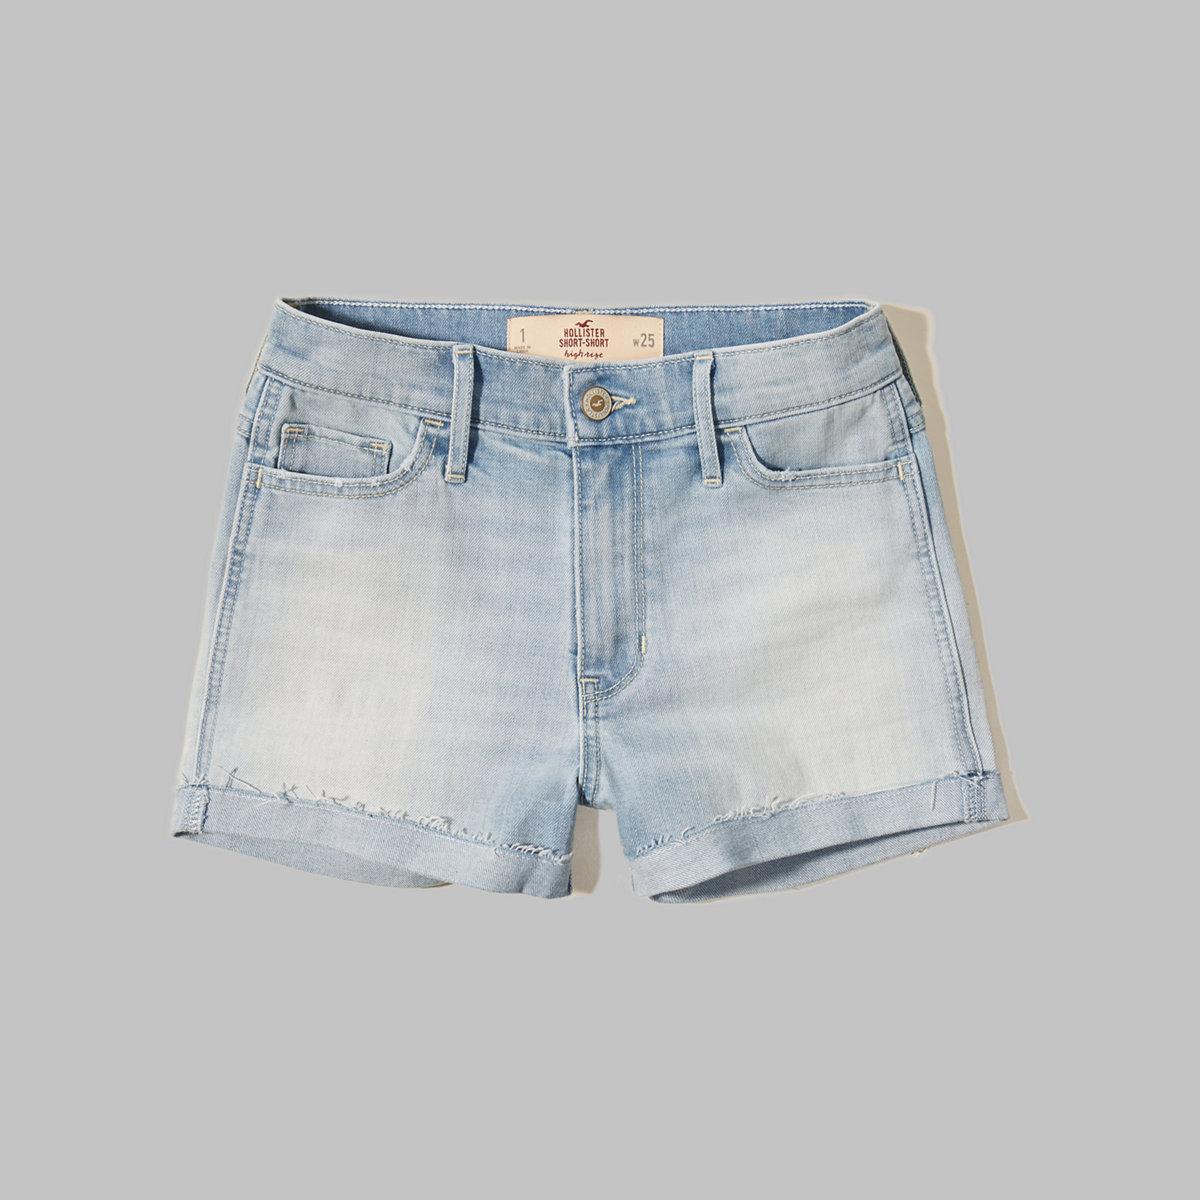 Hollister High Rise Denim Shorts